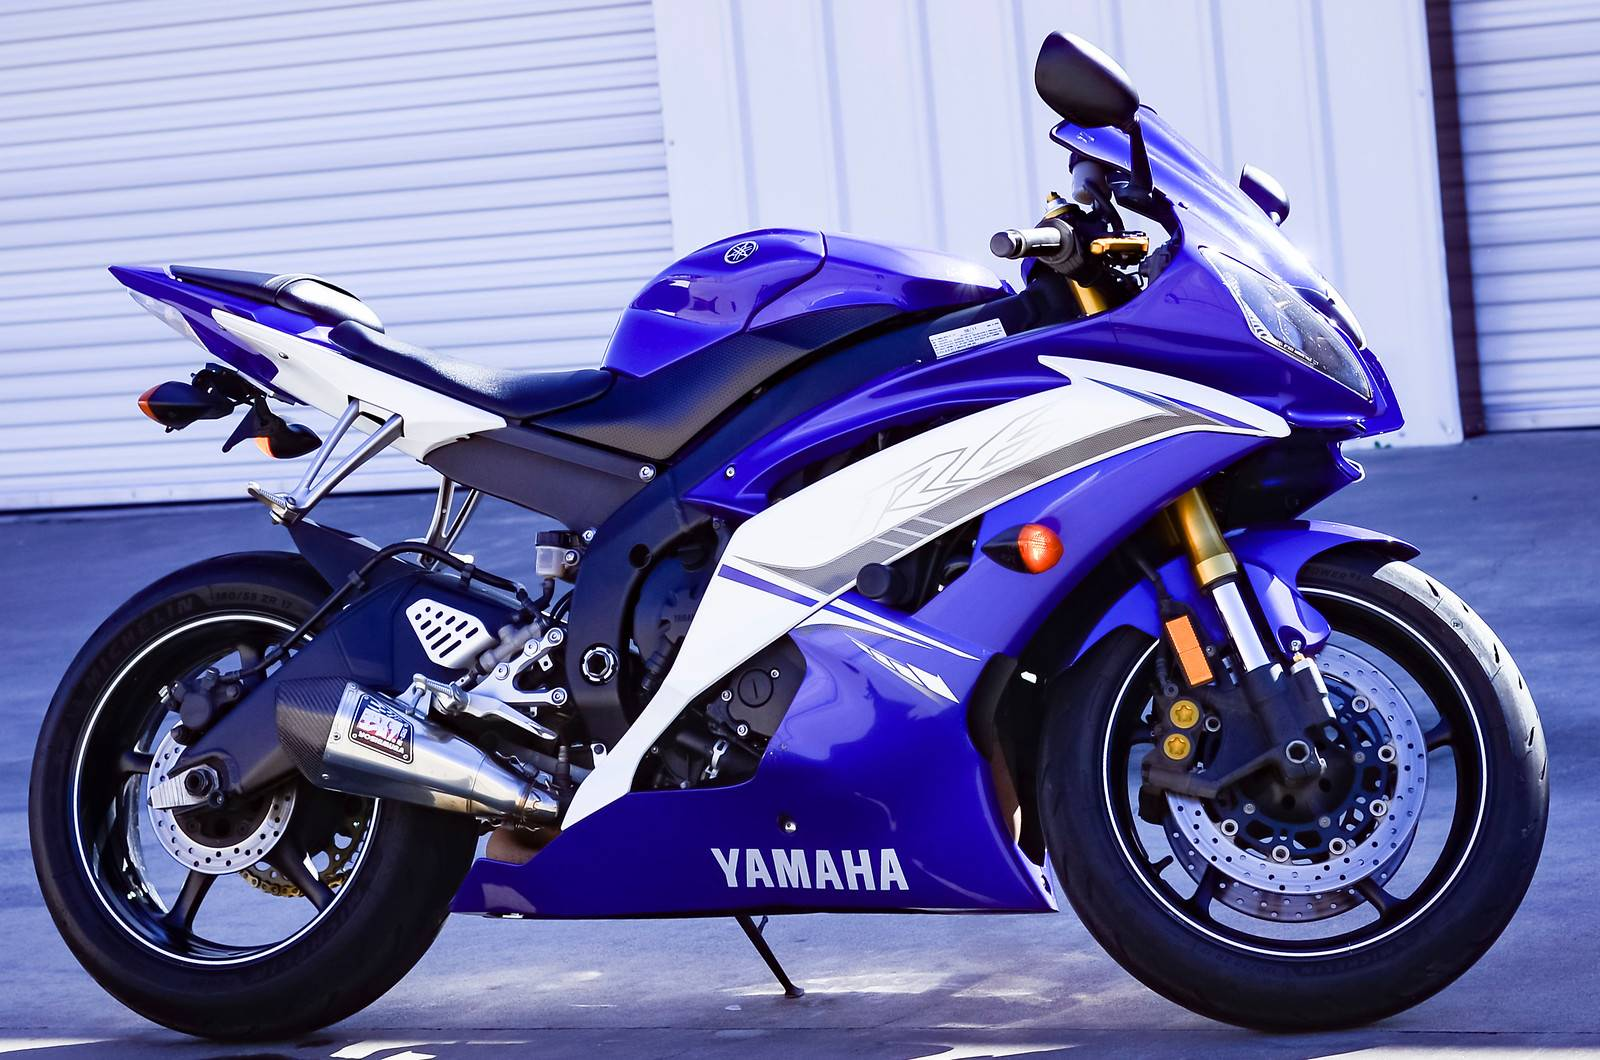 2011 Yamaha YZF-R6 for sale 2305